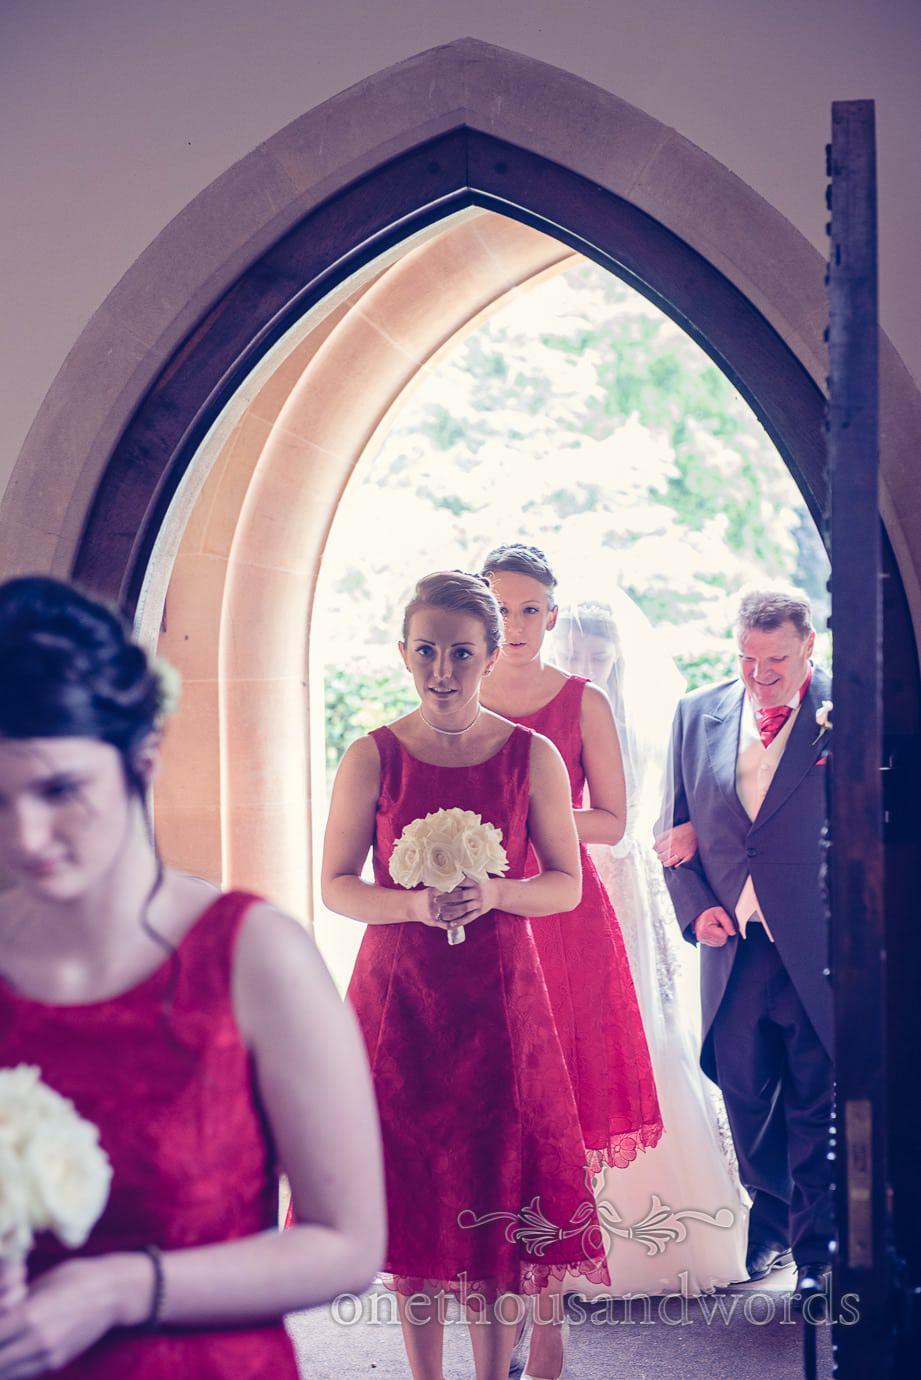 Bridesmaid in red bridesmaid dress enters church wedding ceremony